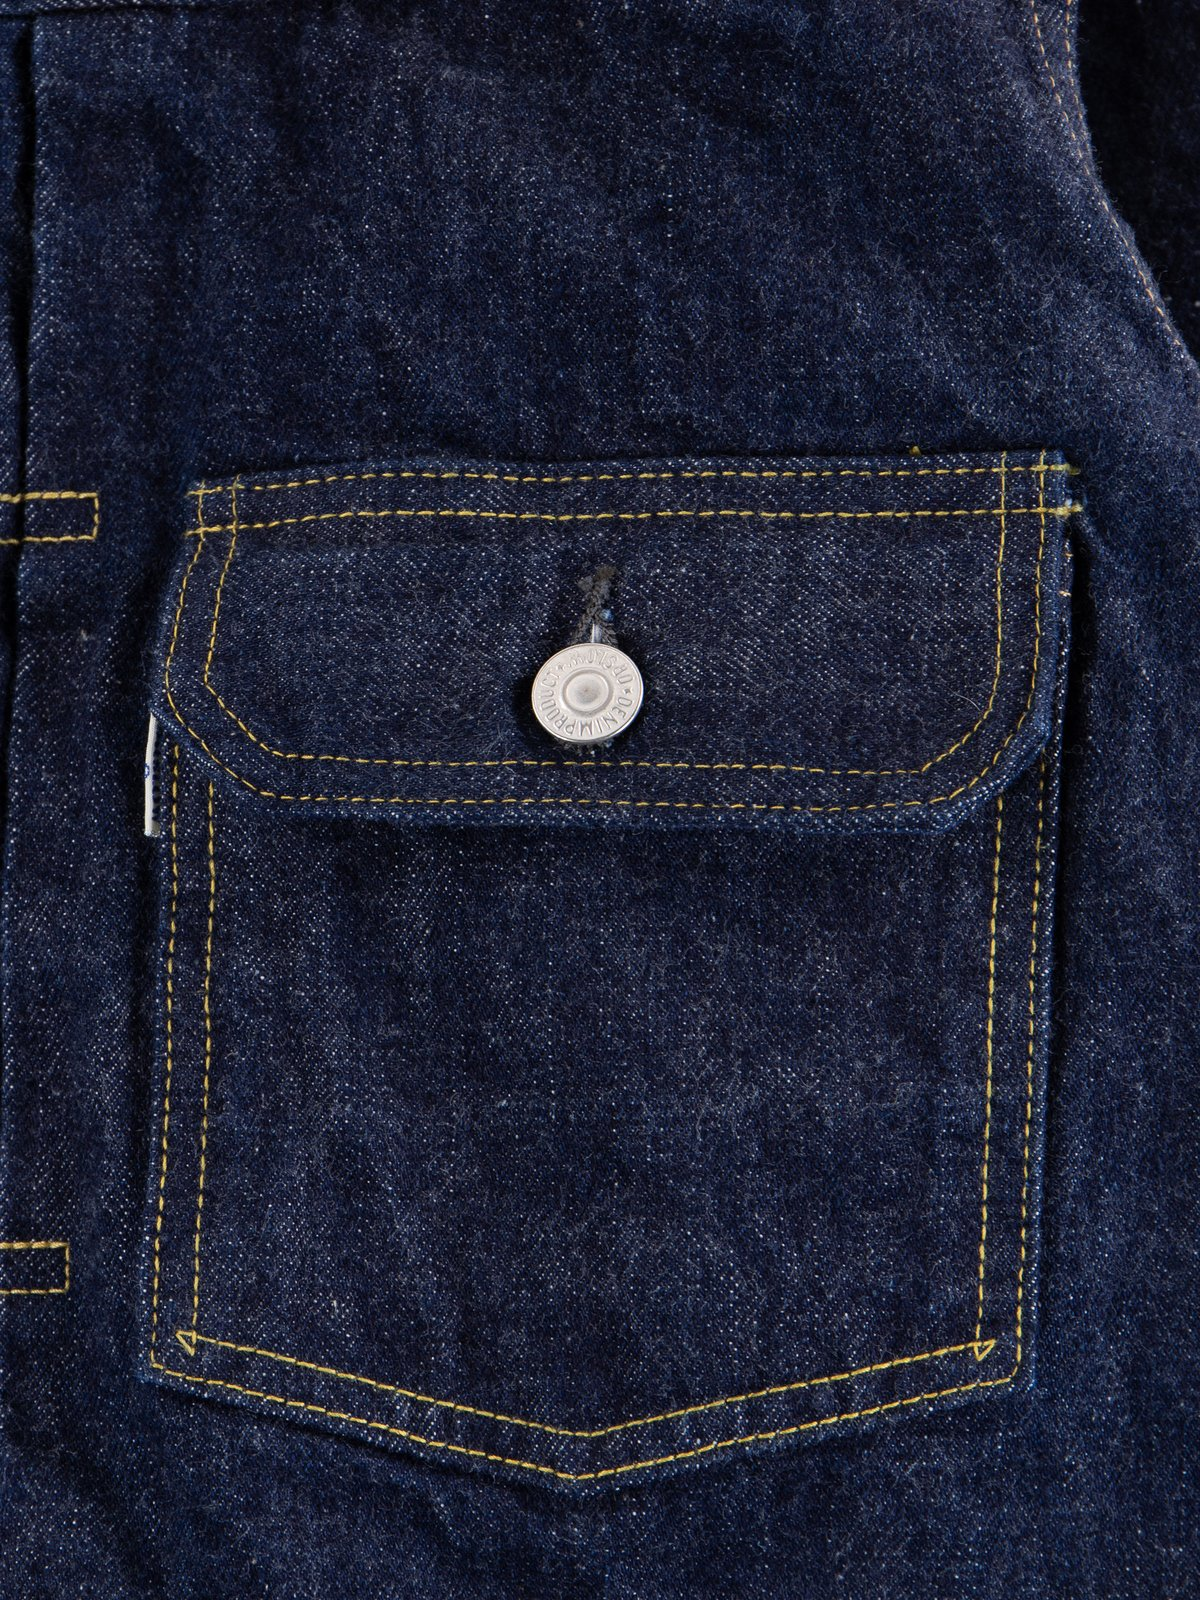 One Wash Type II Denim Jacket - Image 3